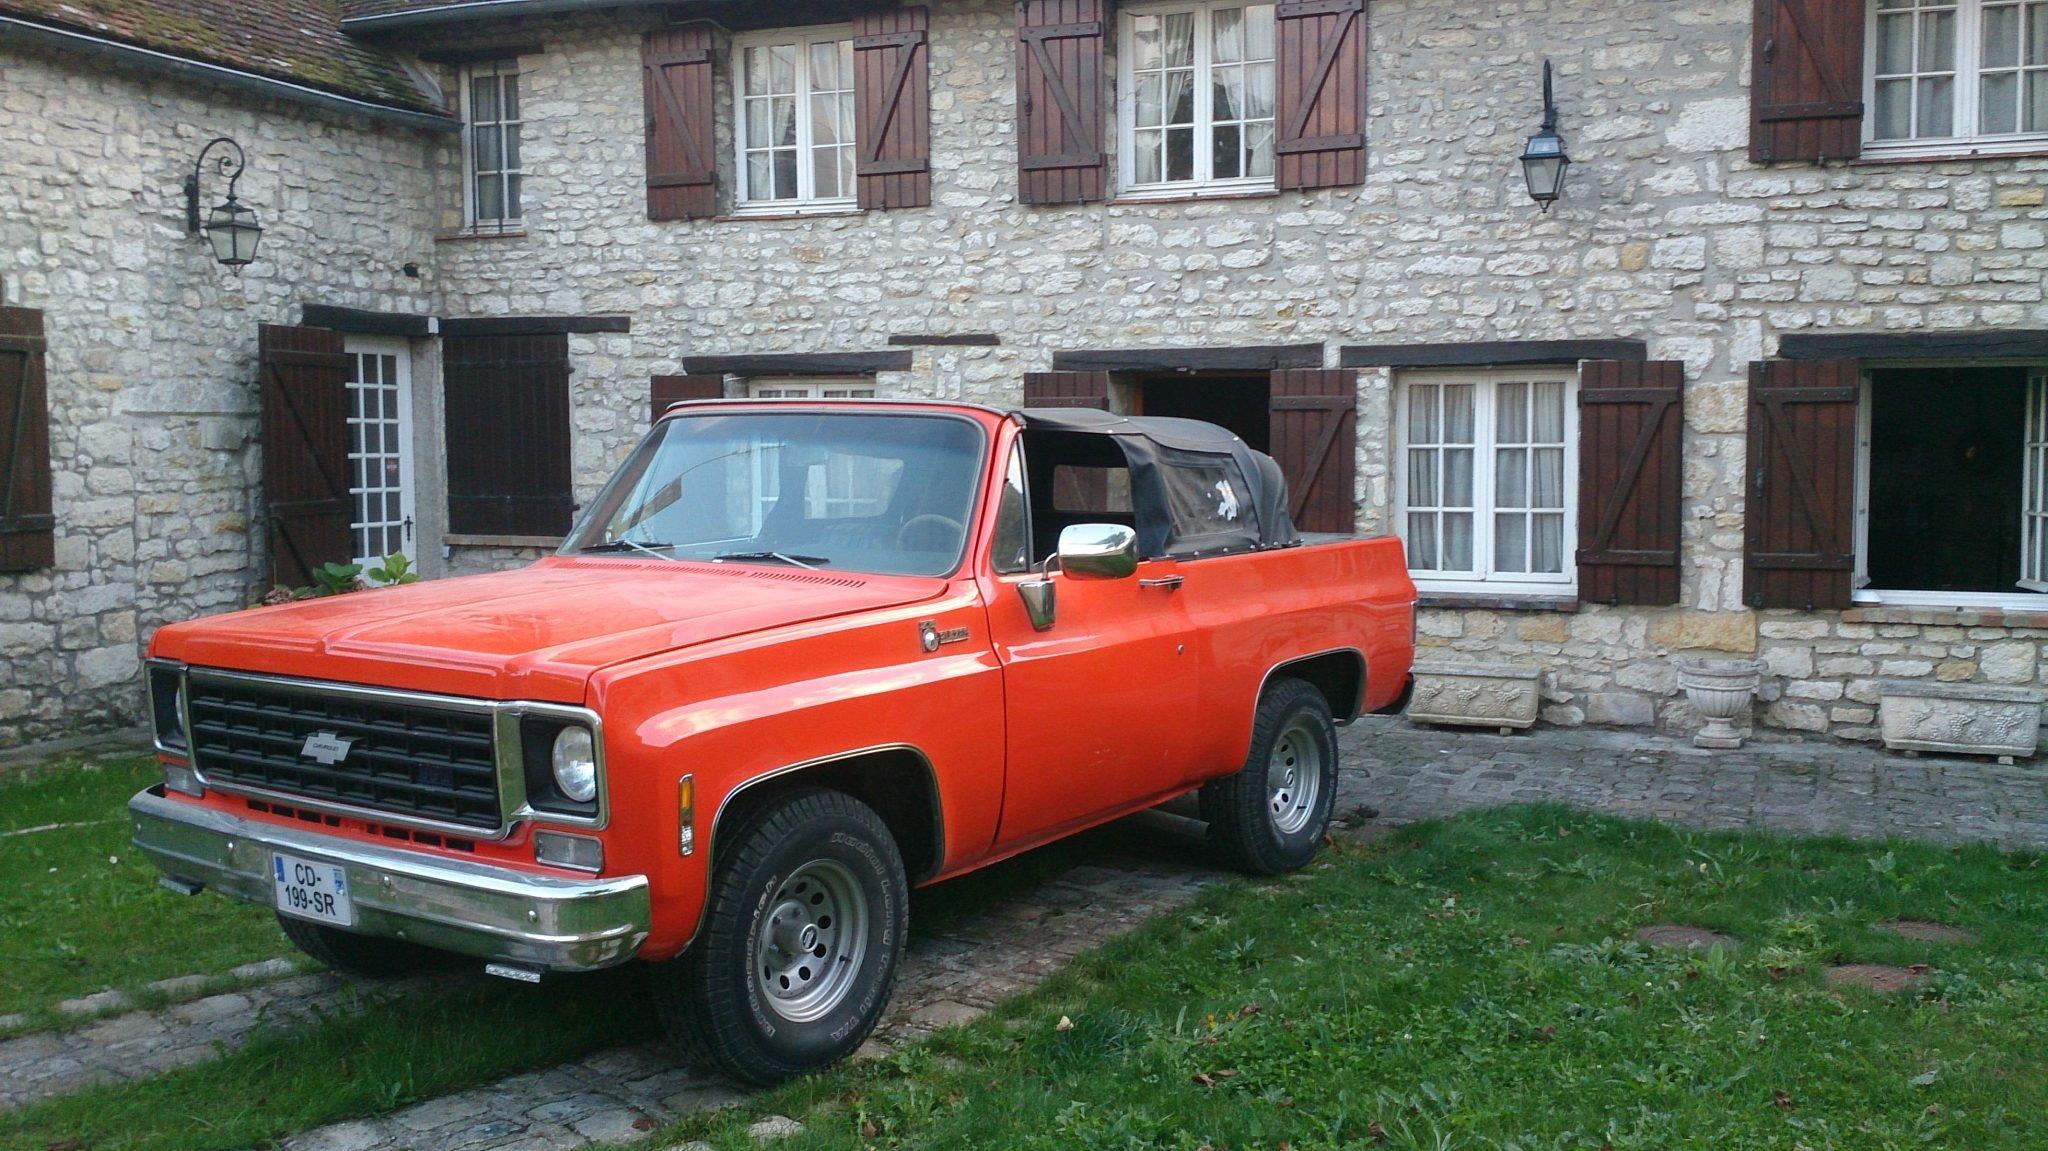 1975 Chevrolet Blazer K5 Cheyenne CABRIOLET UNIQUE For Sale (picture 2 of 6)